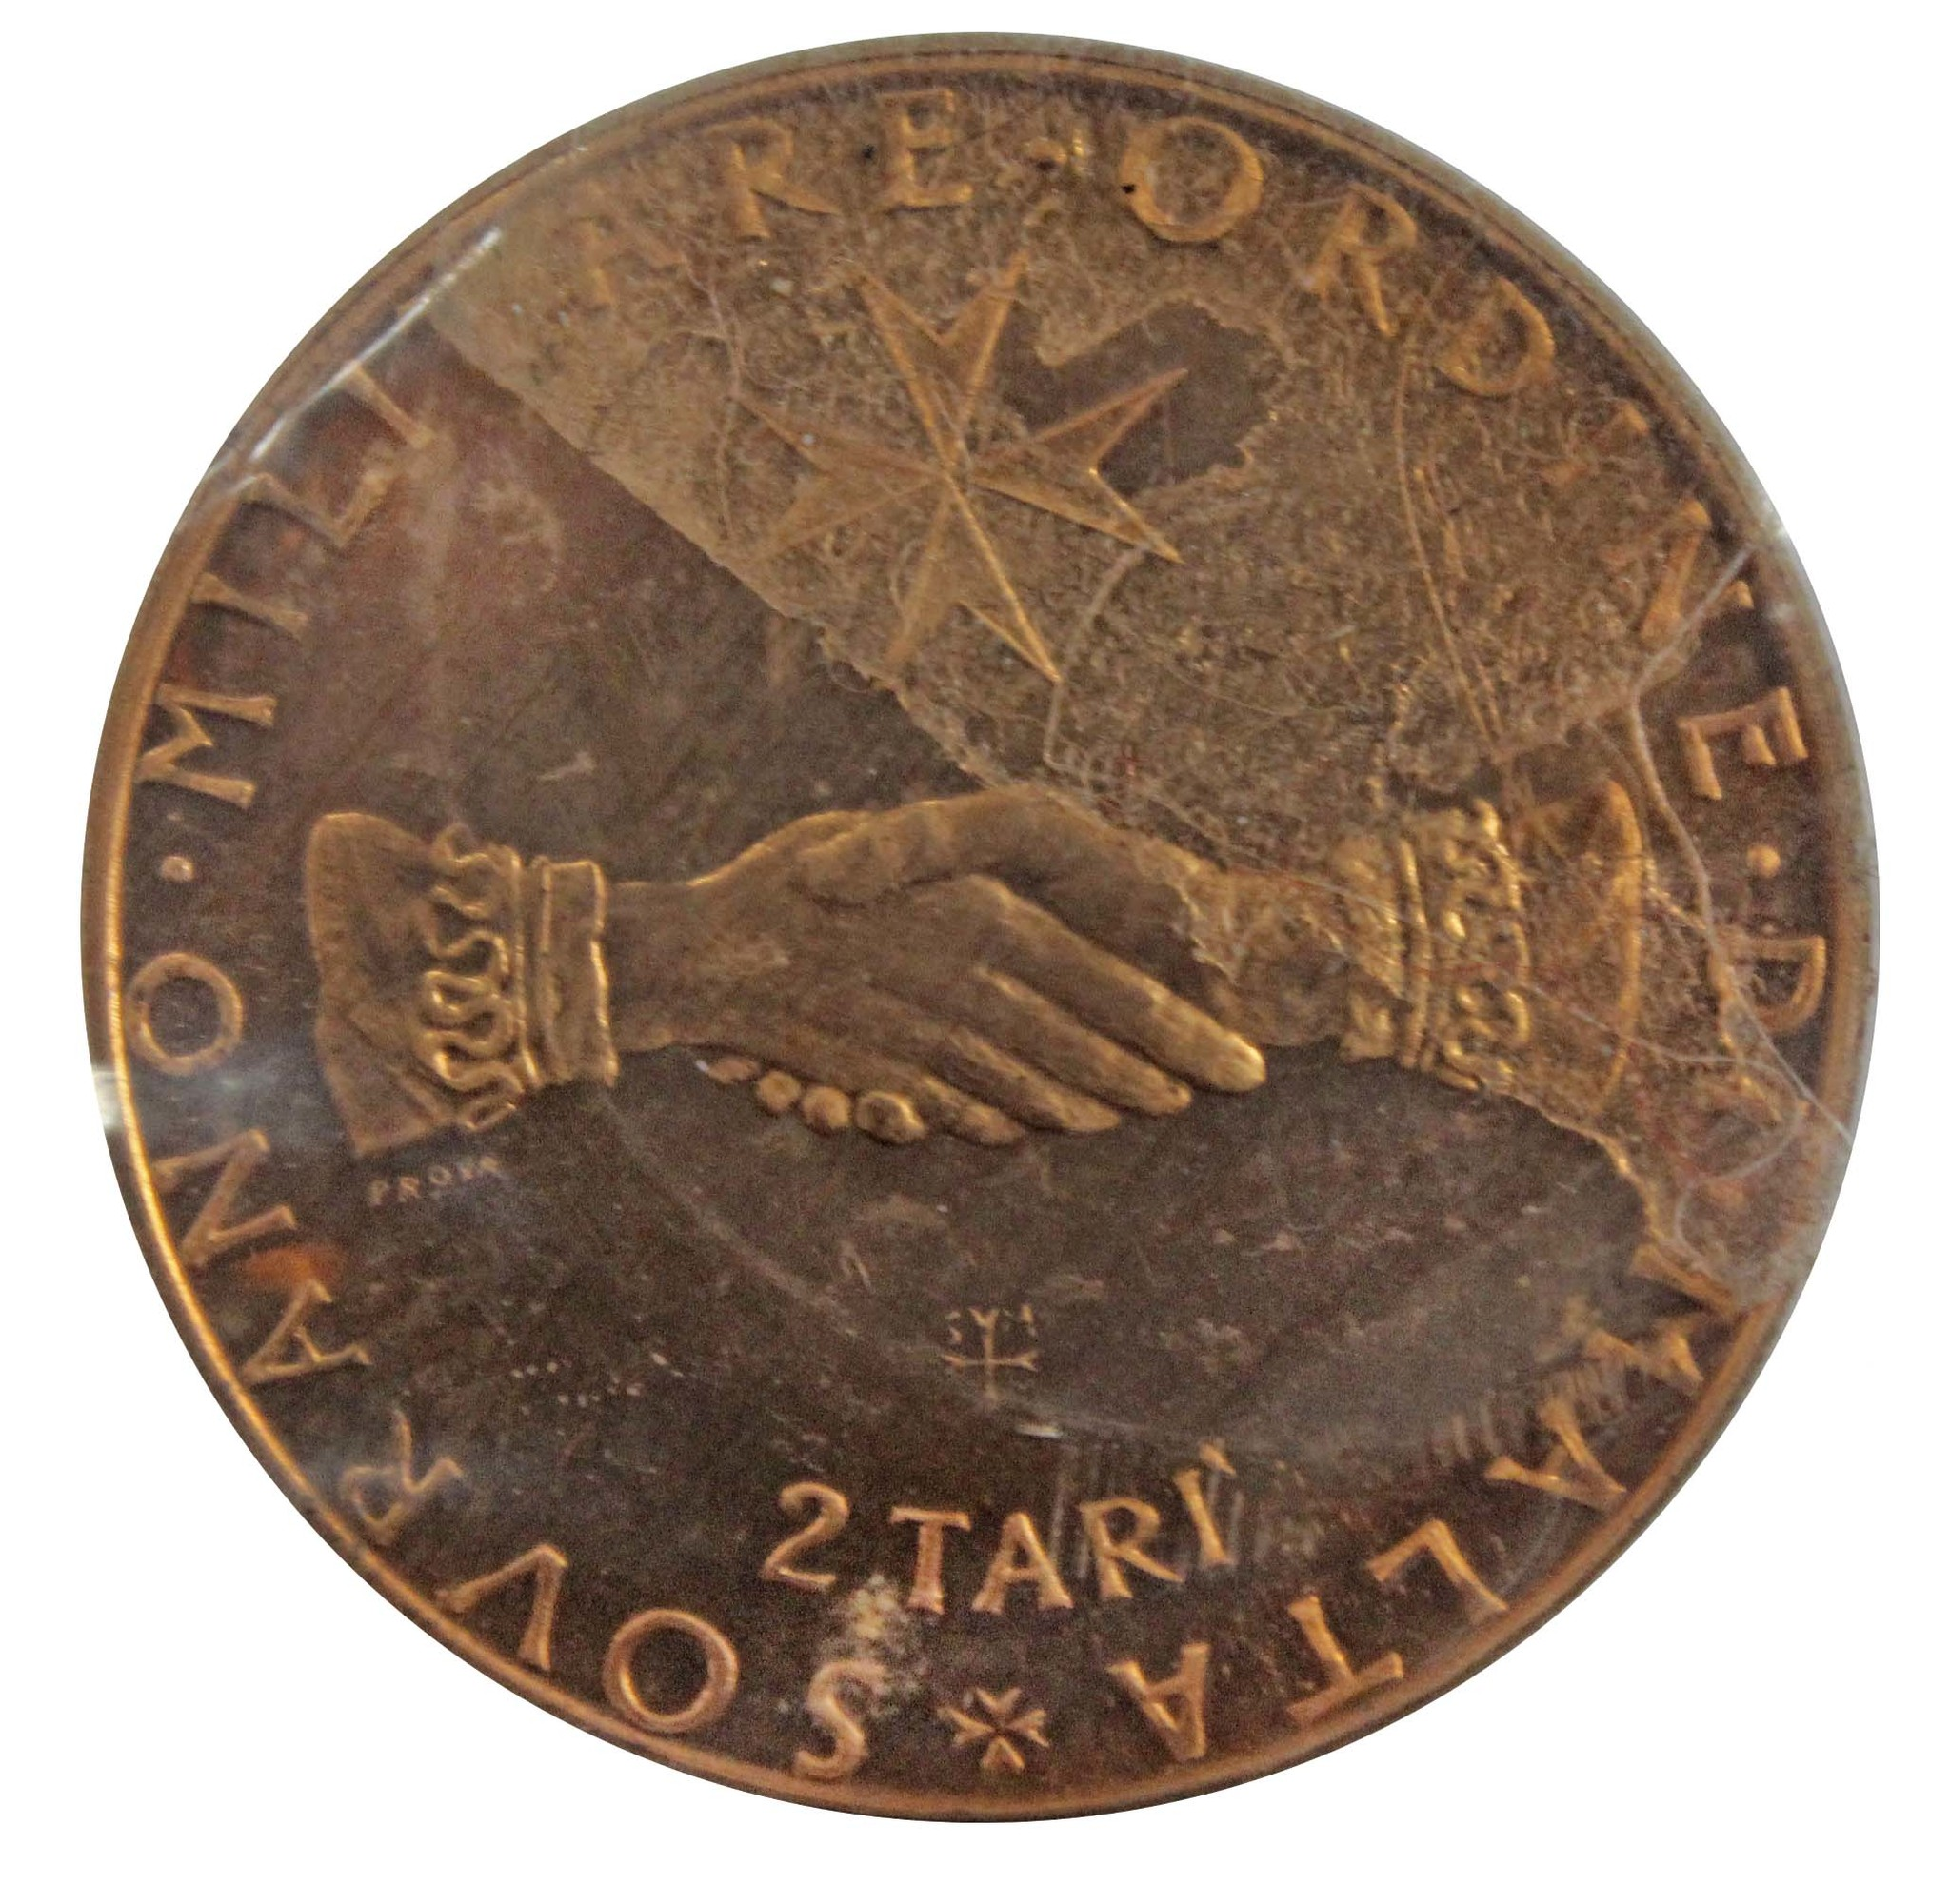 Мальтийский орден 2 тари. Мальта 1968 г. XF-